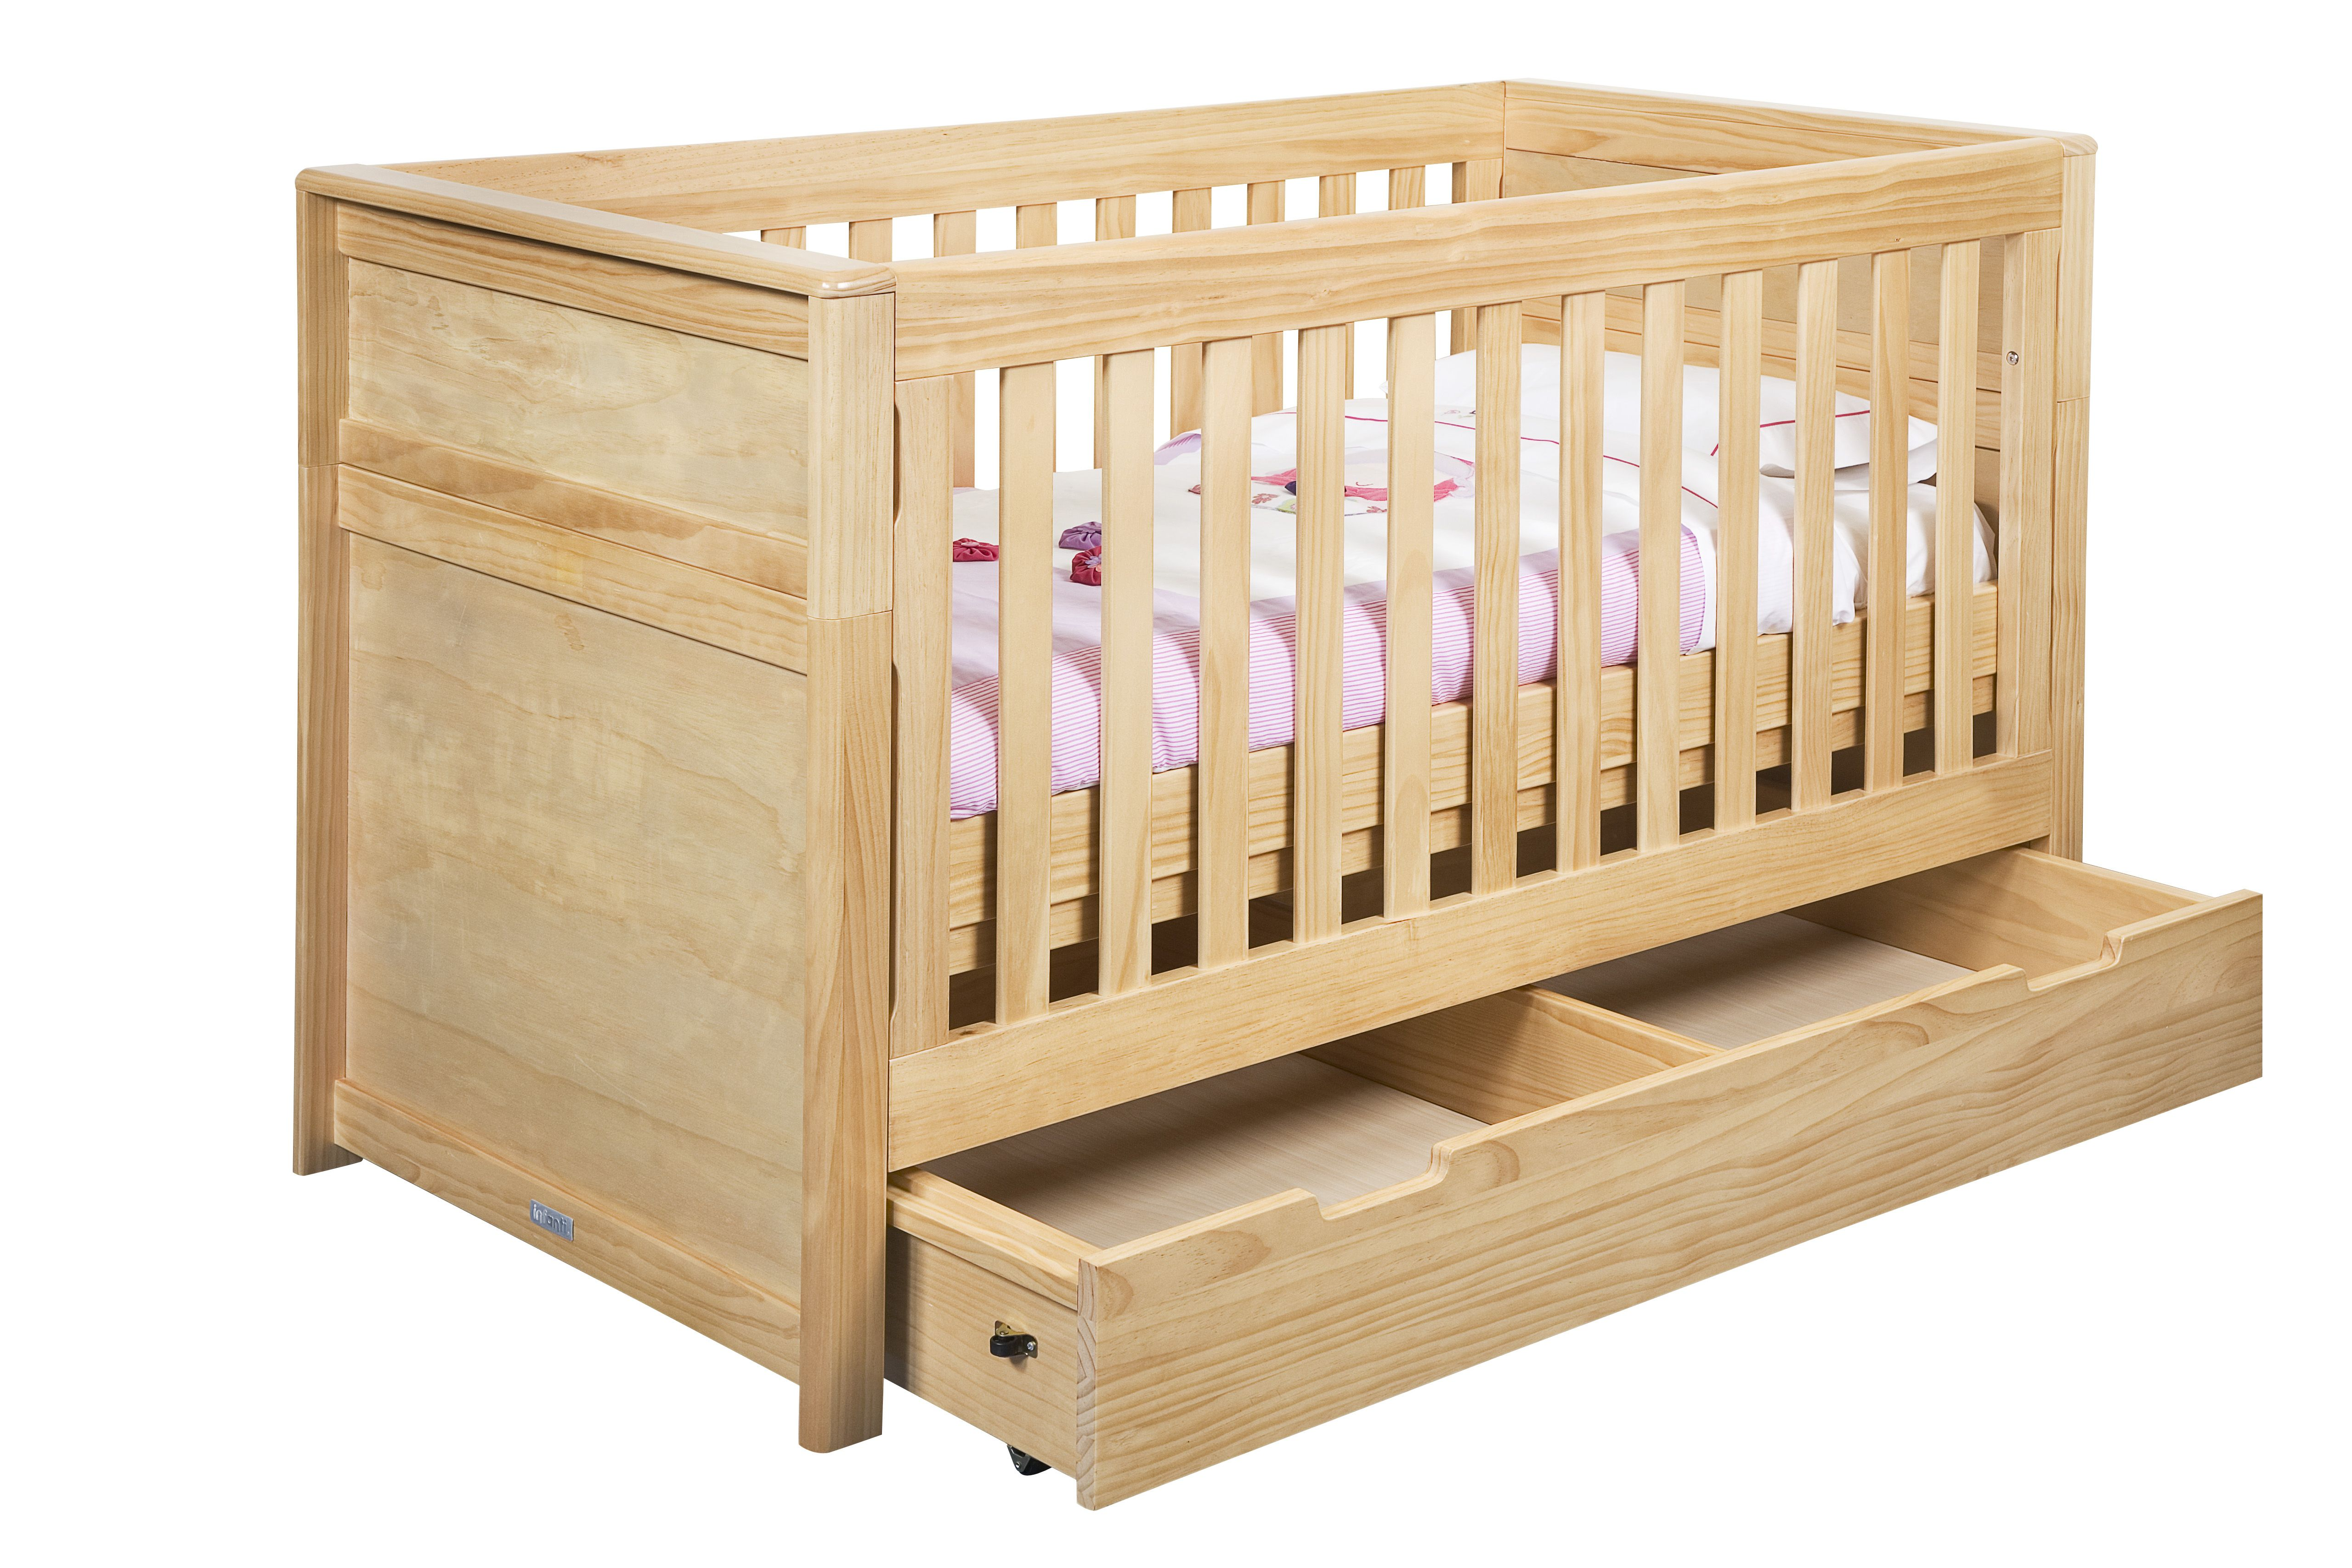 0121d202051 cuna de madera verona mc998a colch n 2 for Cunas para bebes de madera